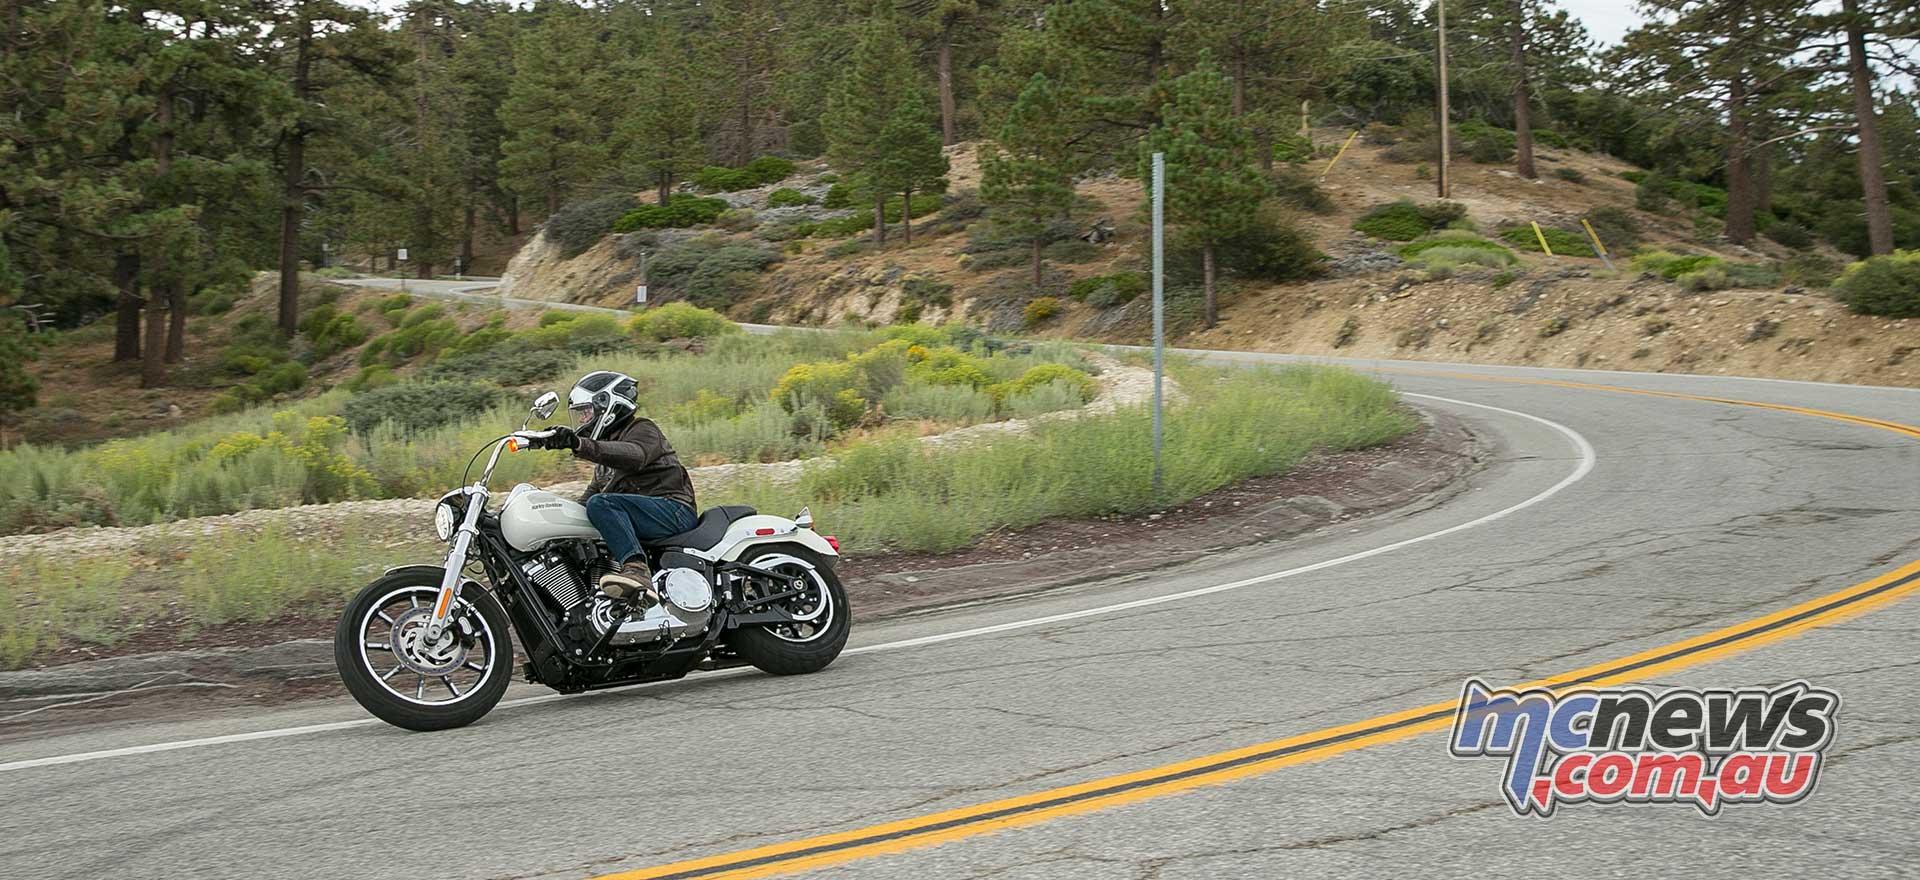 Remarkable Harley Davidson 2018 Softails Motorcycle Tests Mcnews Com Au Inzonedesignstudio Interior Chair Design Inzonedesignstudiocom